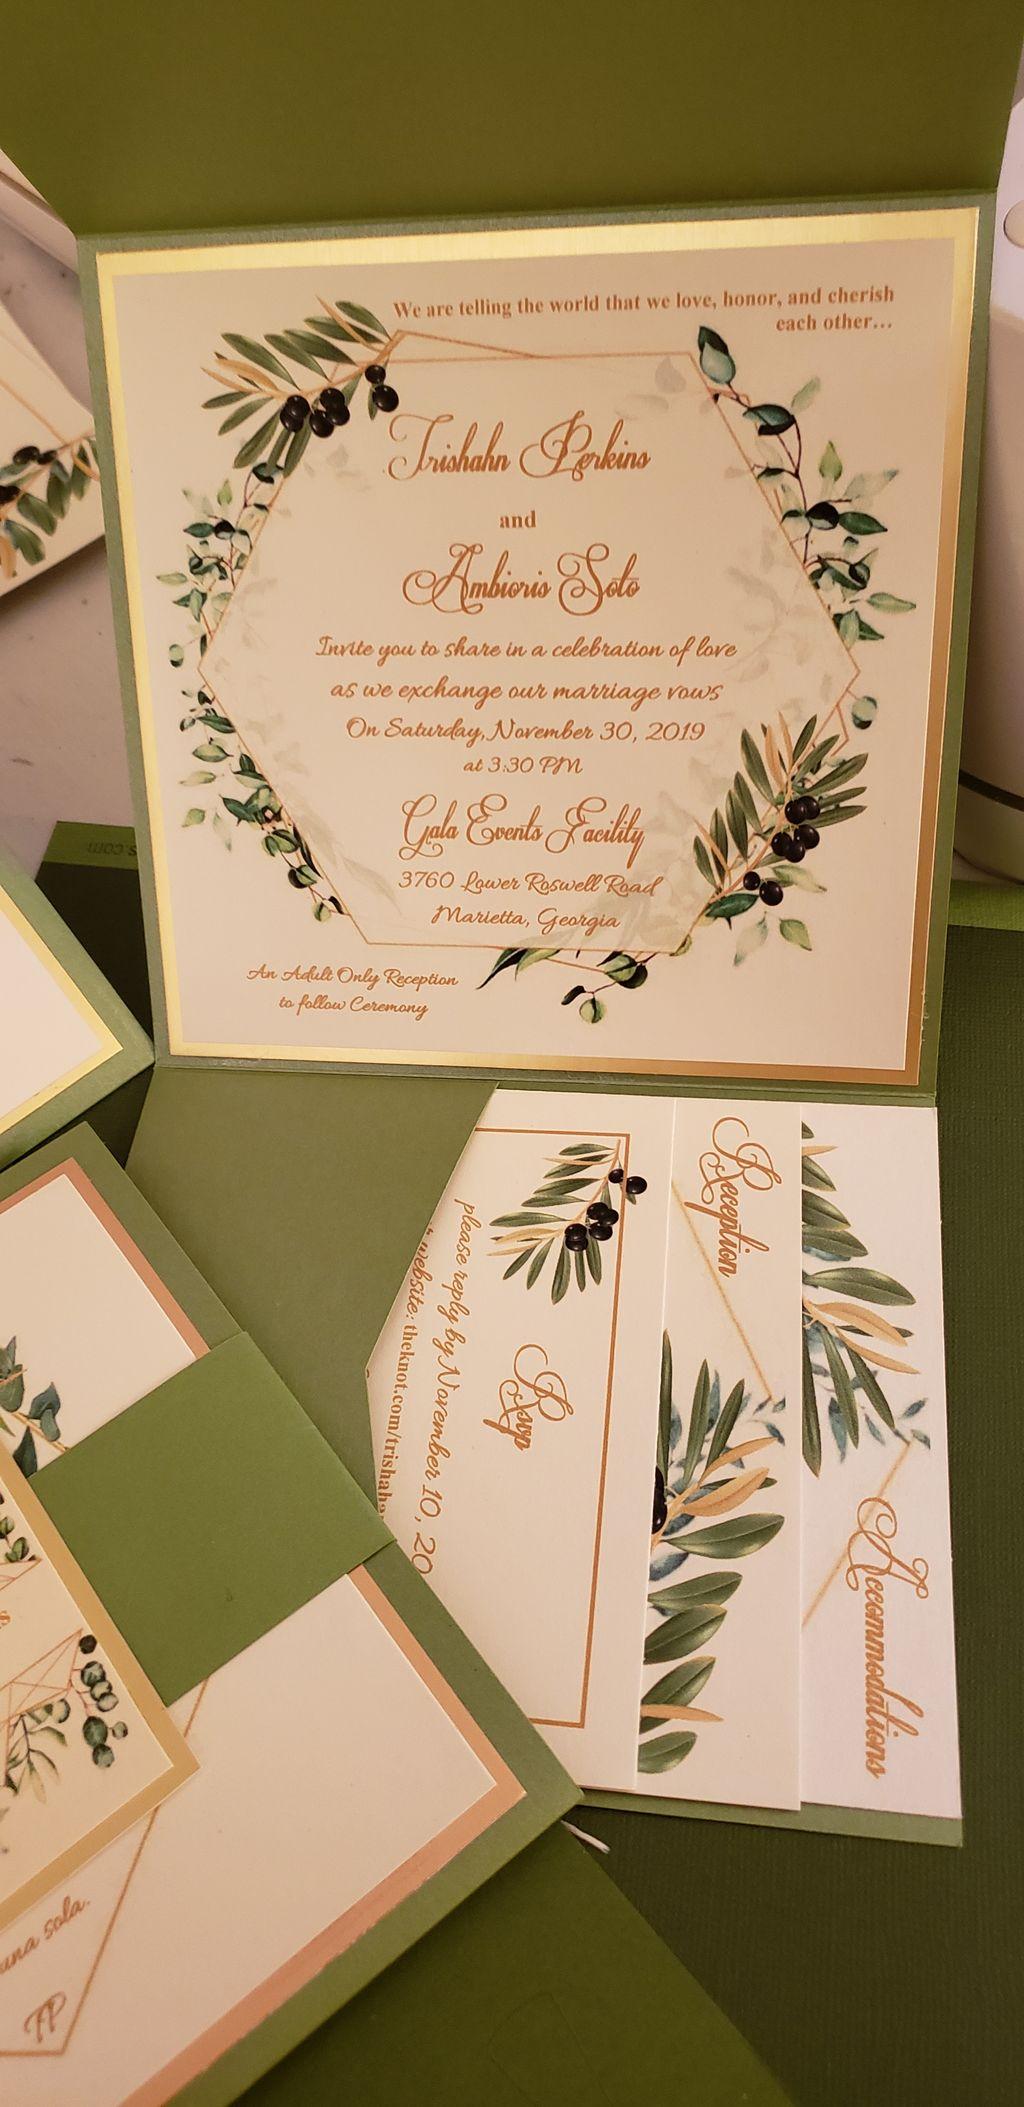 Wedding and Event Invitations - Suwanee 2019